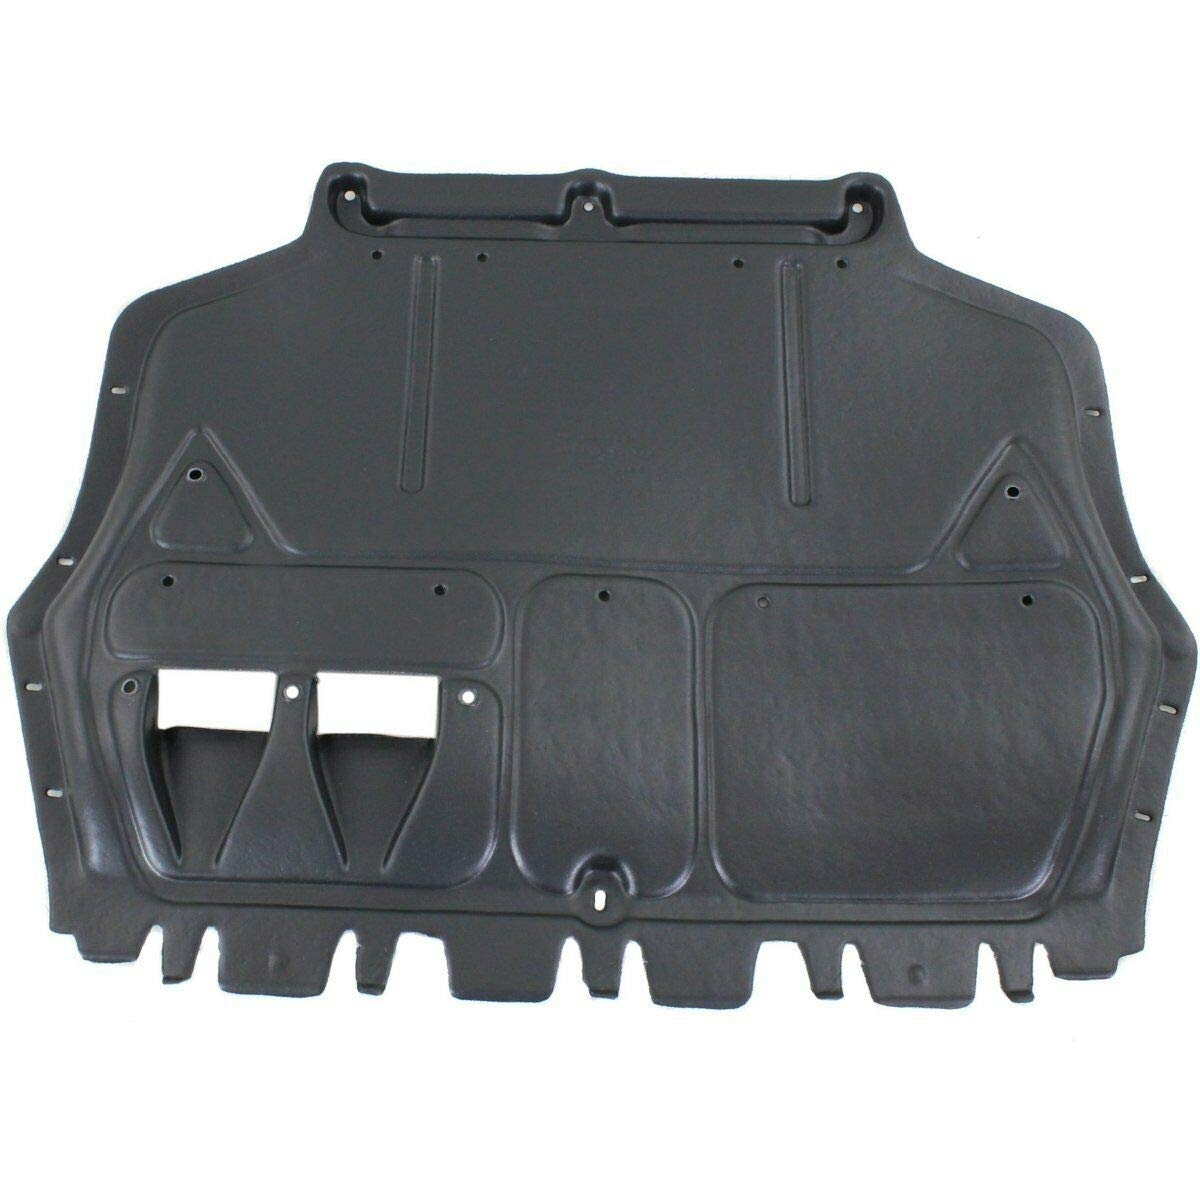 KA LEGEND Engine Under Cover Splash Shield Guard Front for 2012-2015 Passat 561825237D VW1228121